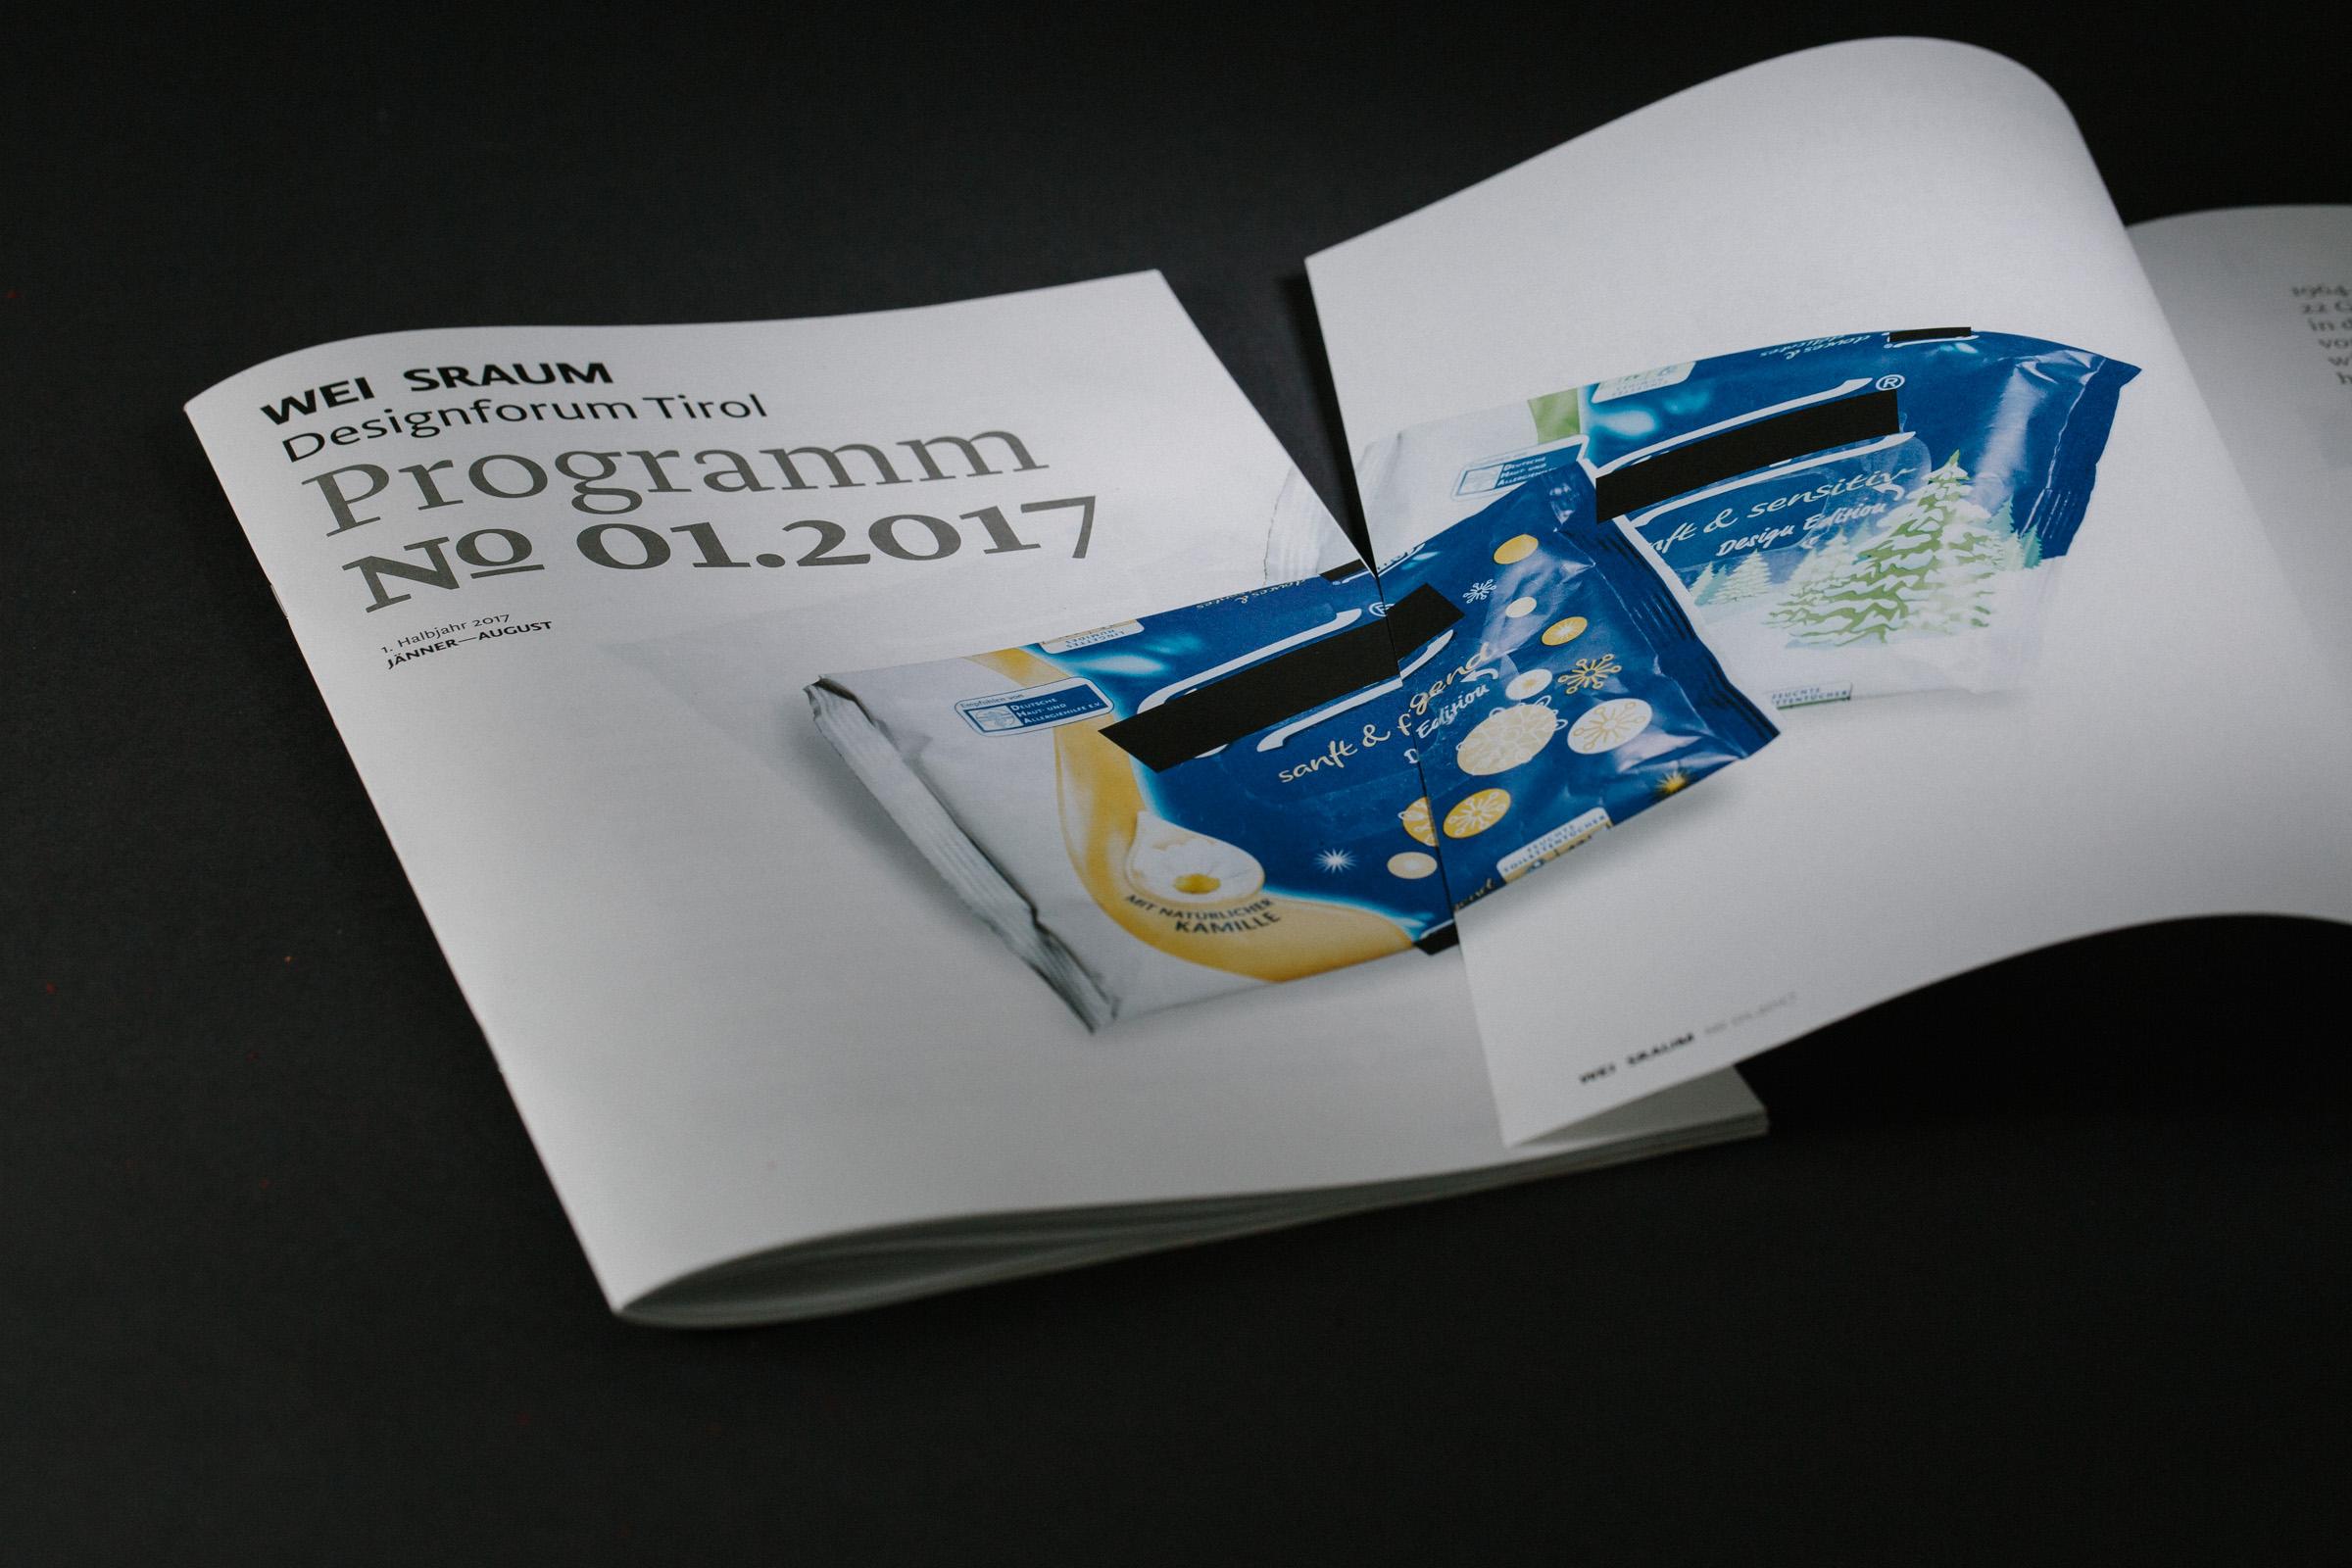 Programmheft 01/2017